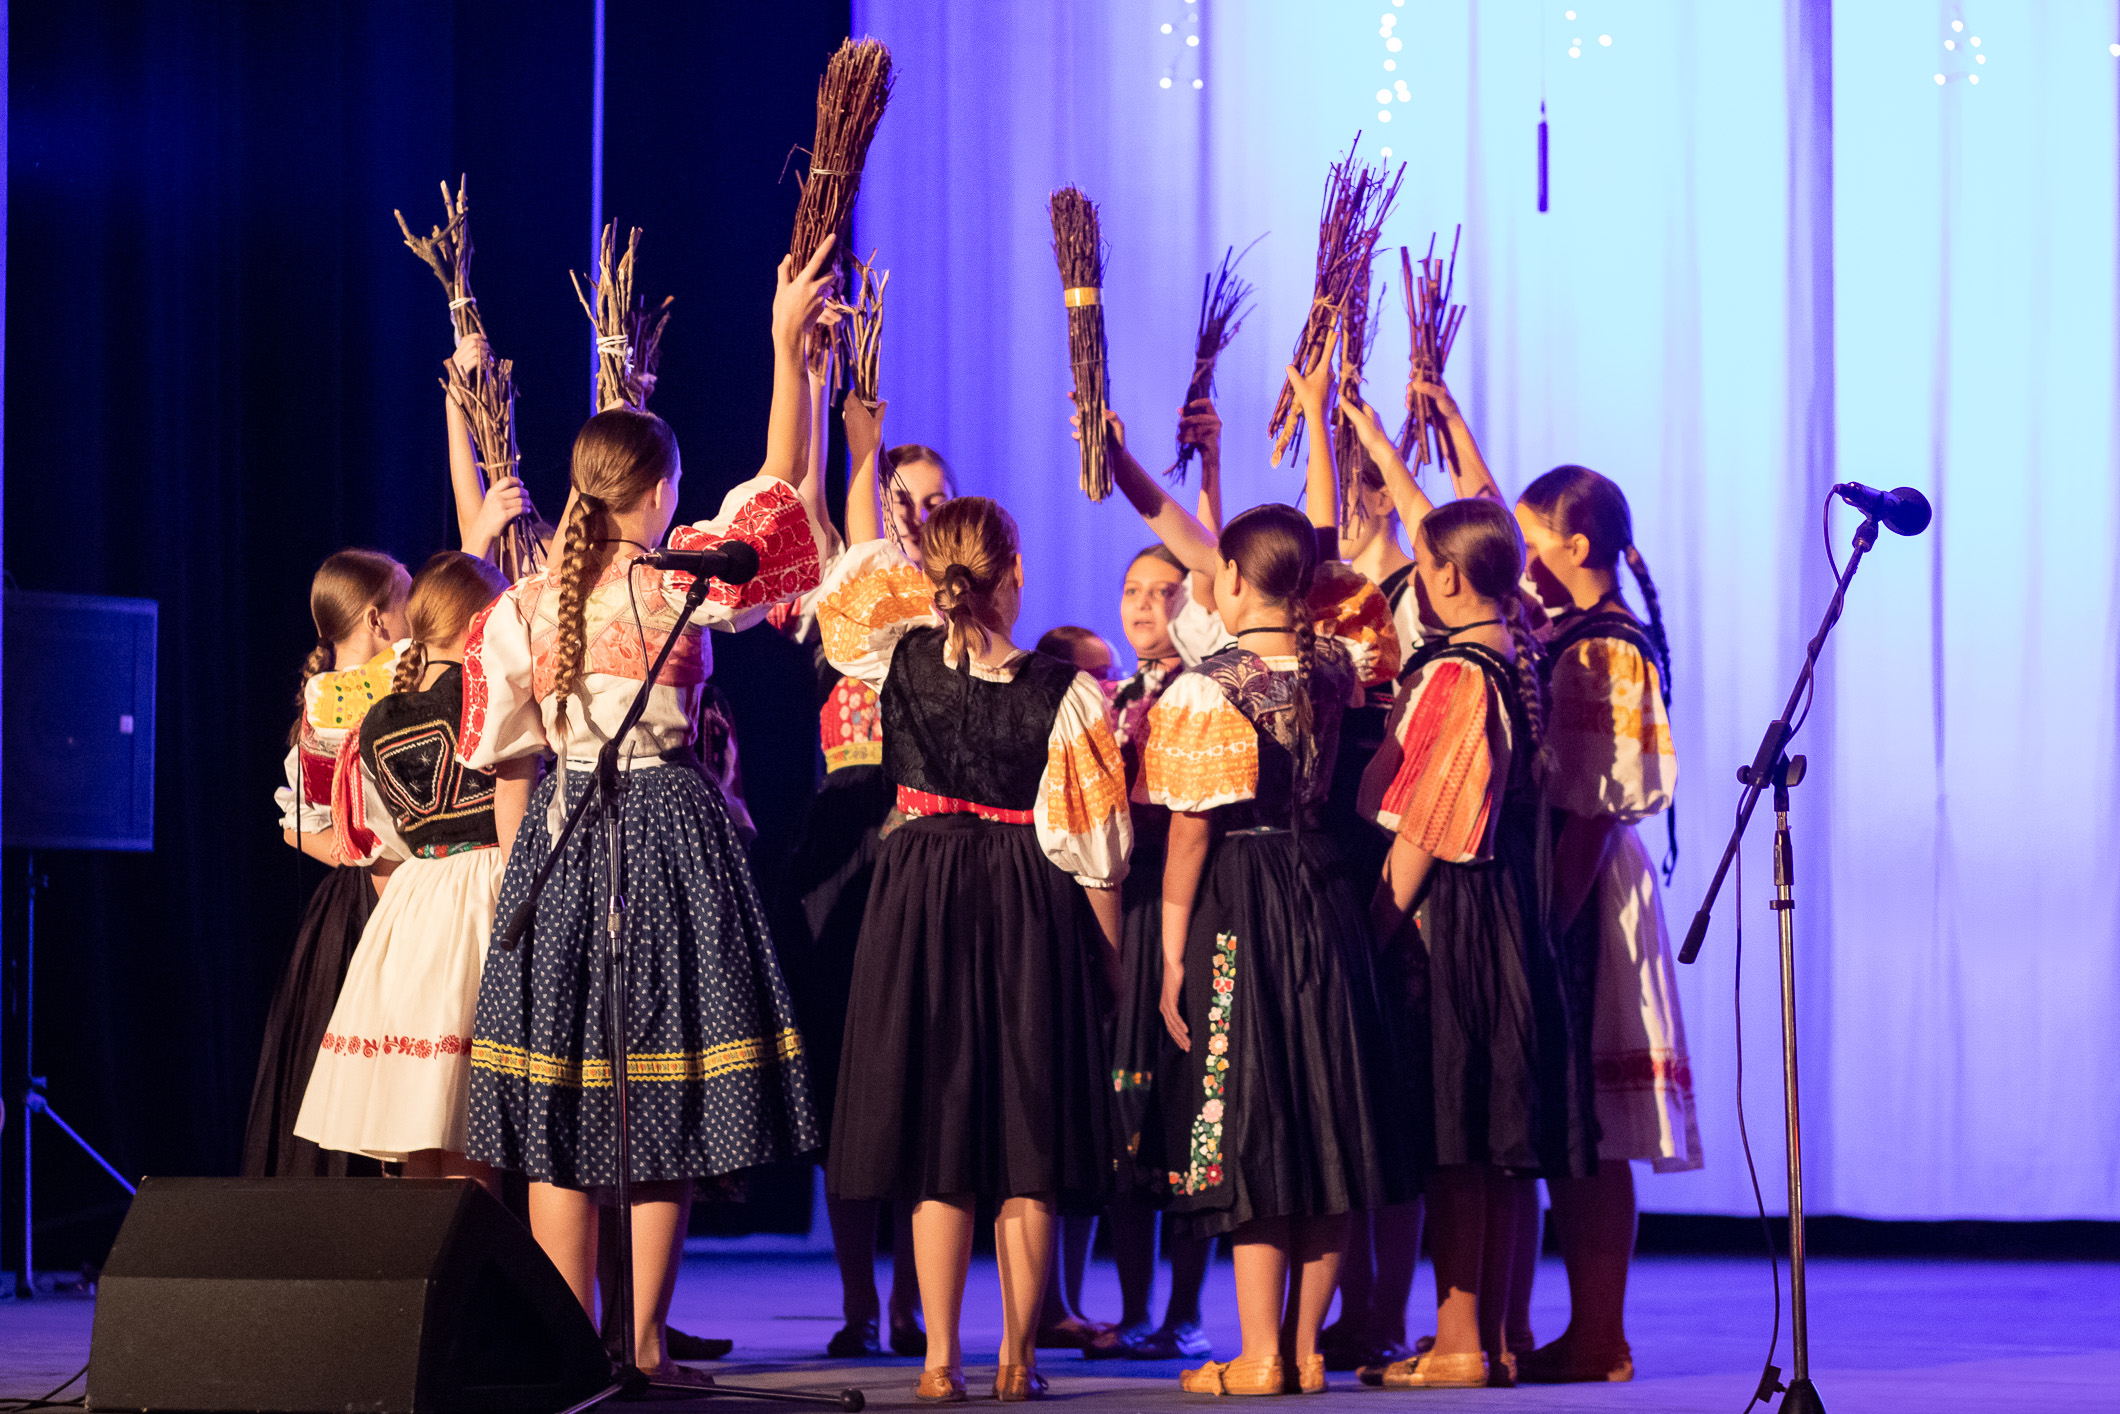 nadych-vianoc-zornicka-marina-8